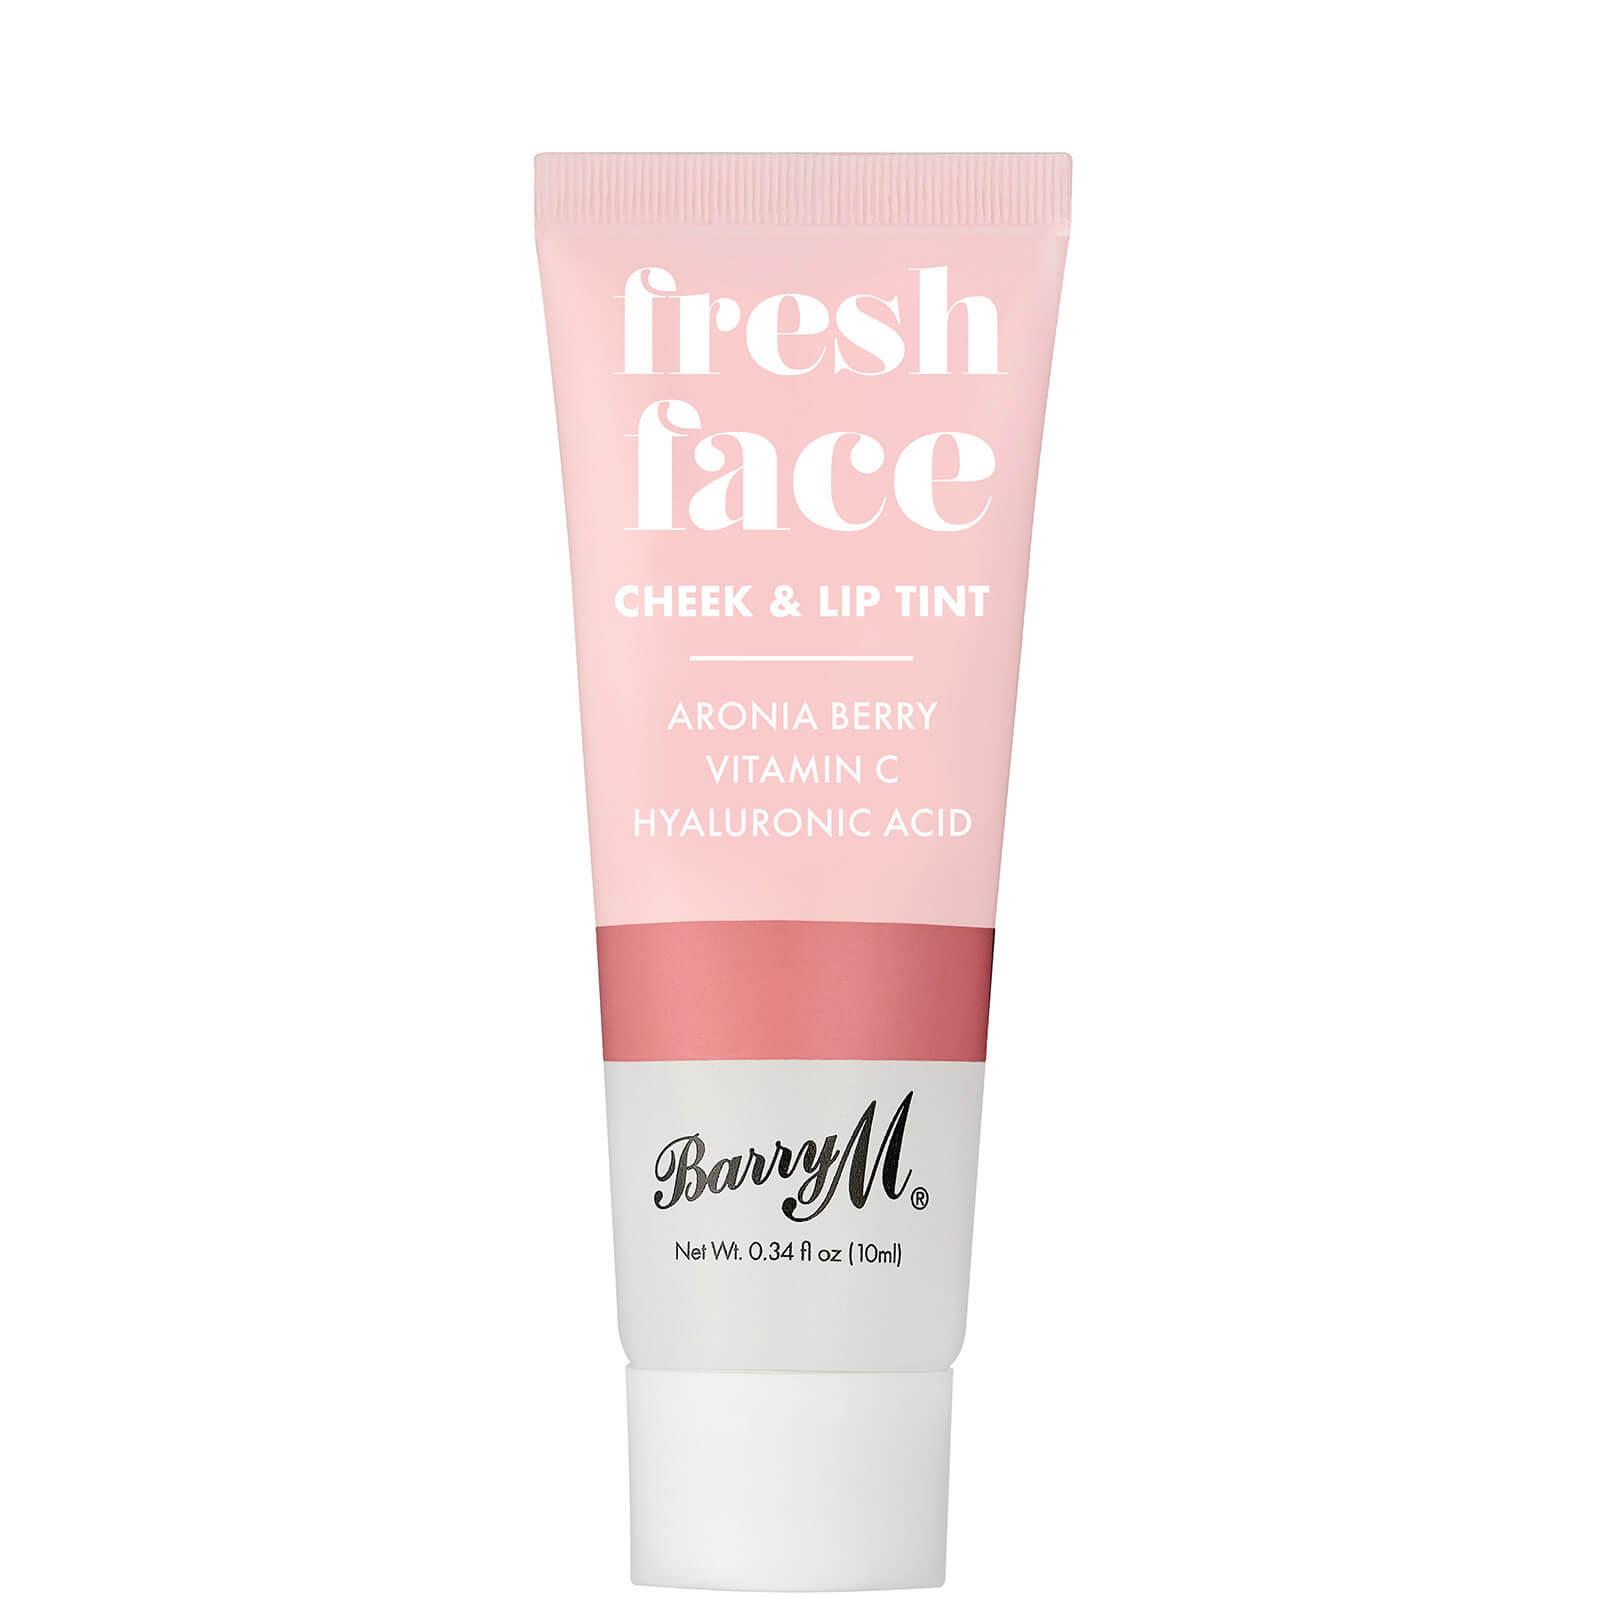 Купить Barry M Cosmetics Fresh Face Cheek and Lip Tint 10ml (Various Shades) - Summer Rose